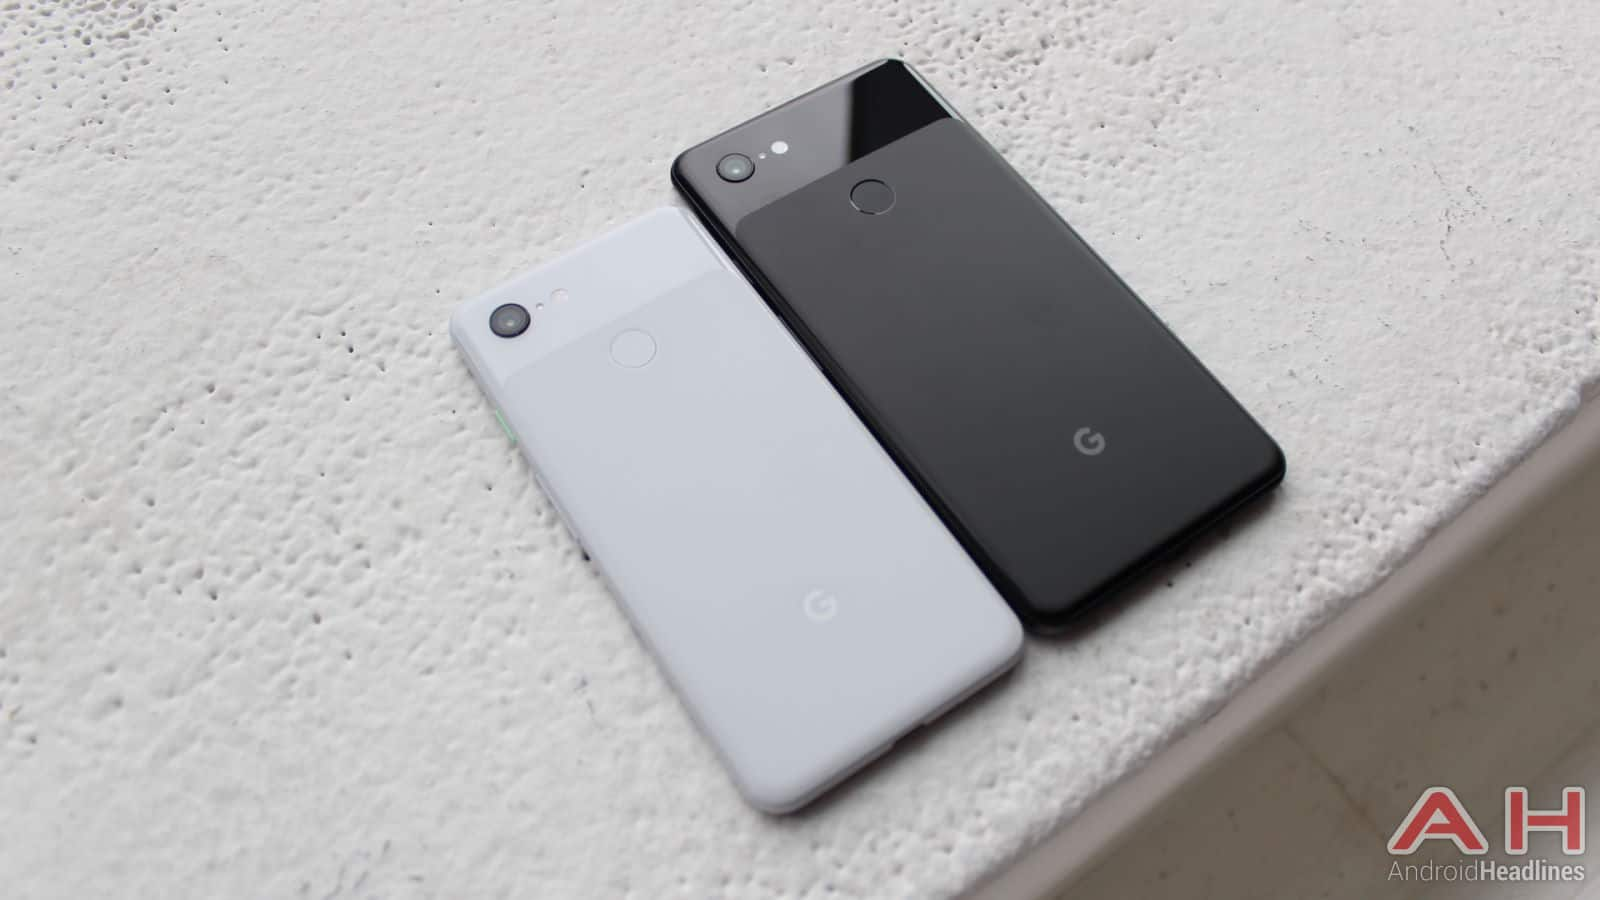 Google Pixel 3 3 XL Hands On AH 4